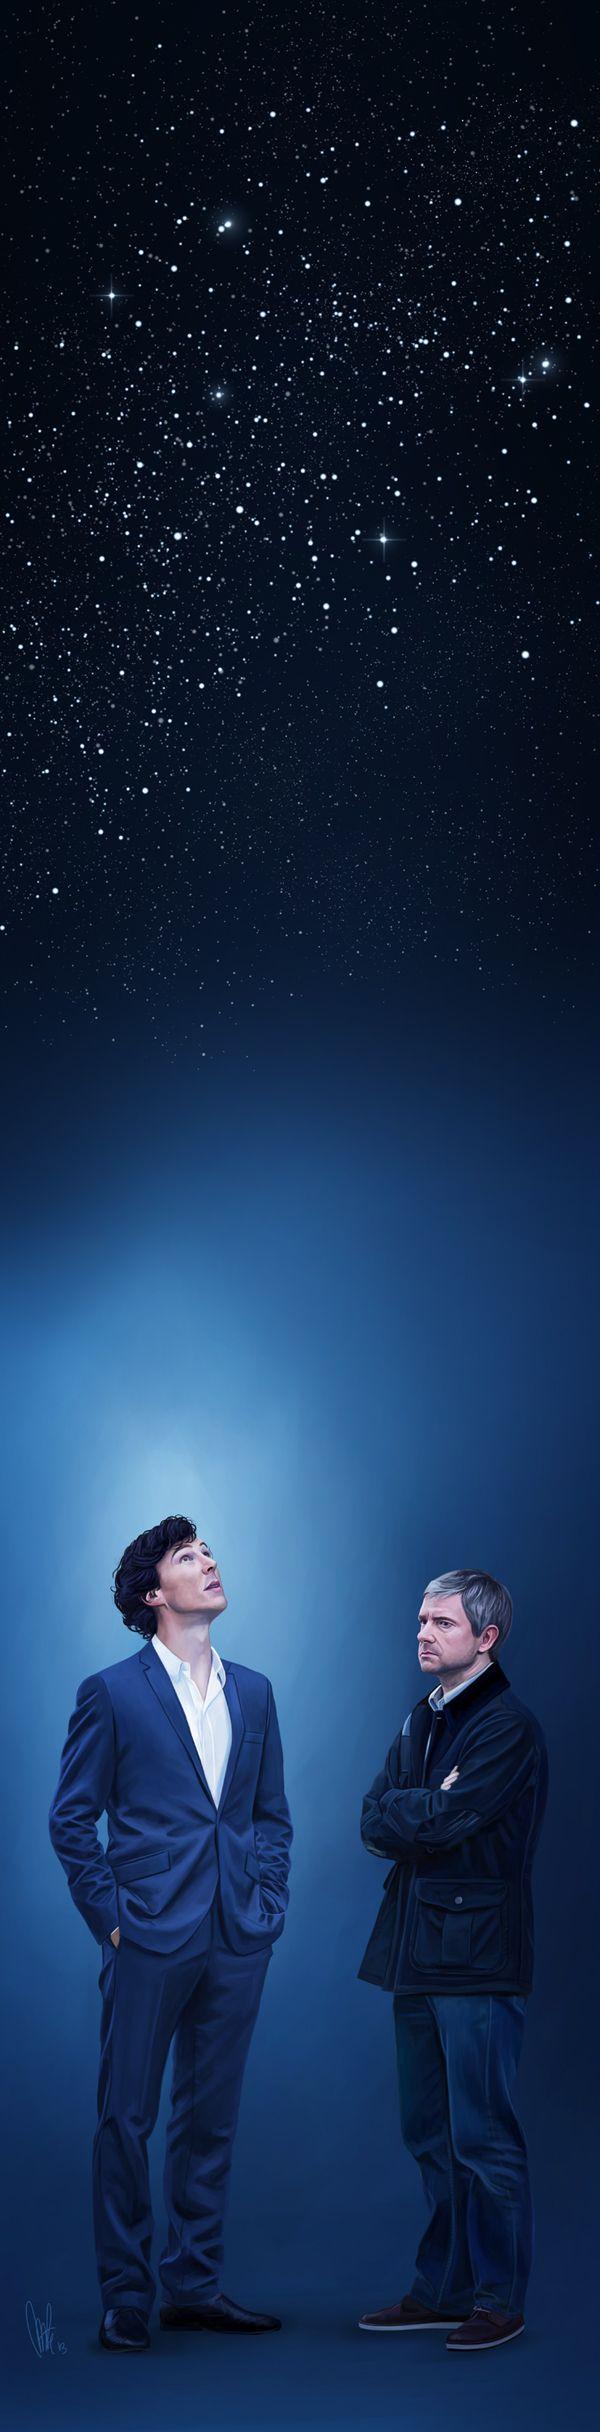 The solar system - Sherlock | by tillieke @ DeviantART.com // bbc sherlock; sherlock holmes; john watson